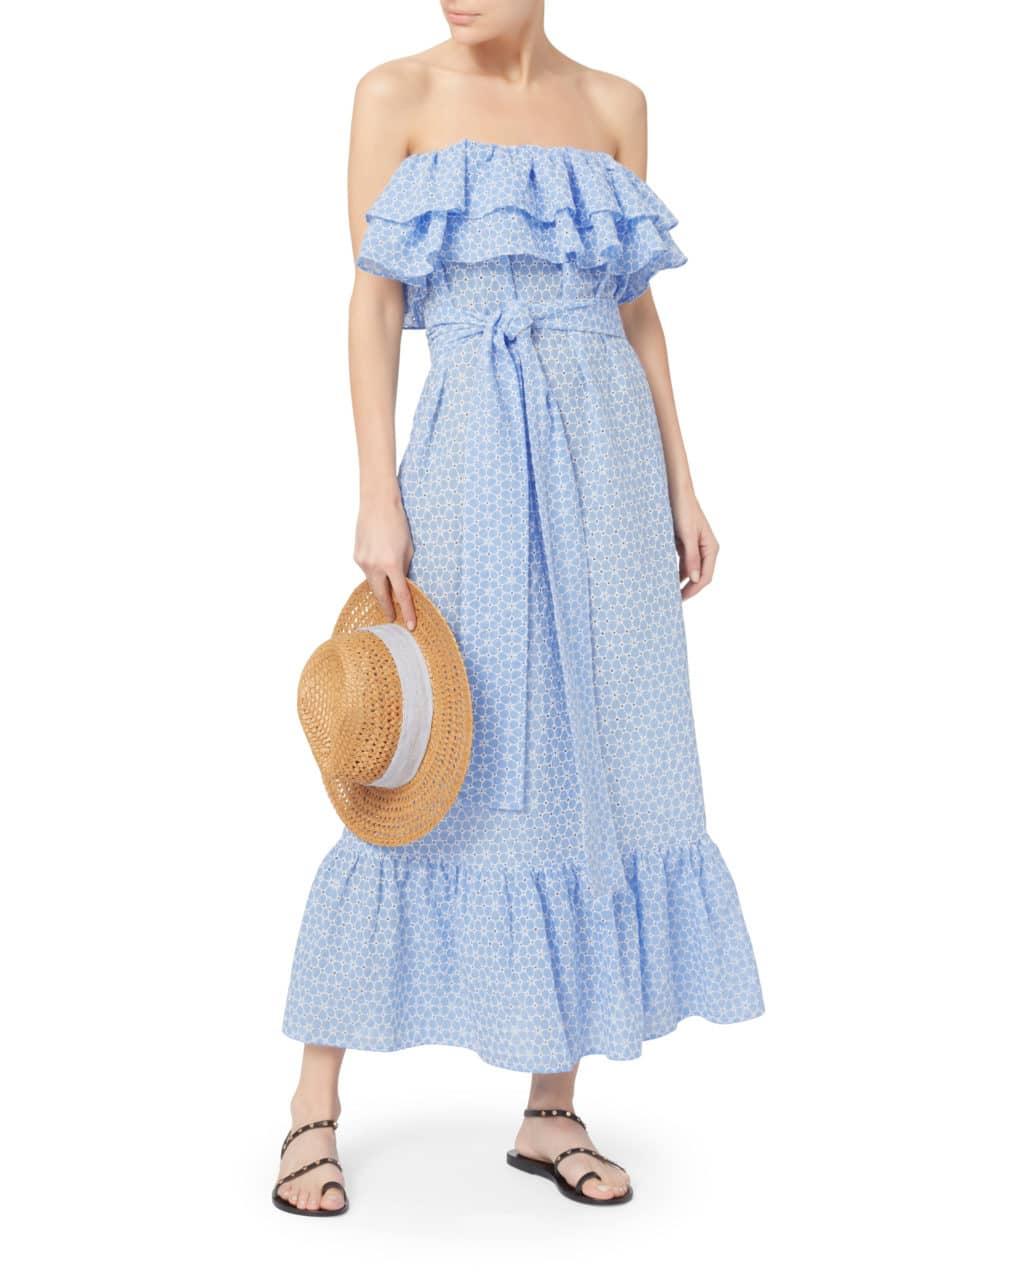 LISA MARIE FERNANDEZ Sabine Strapless Ruffle Blue Dress